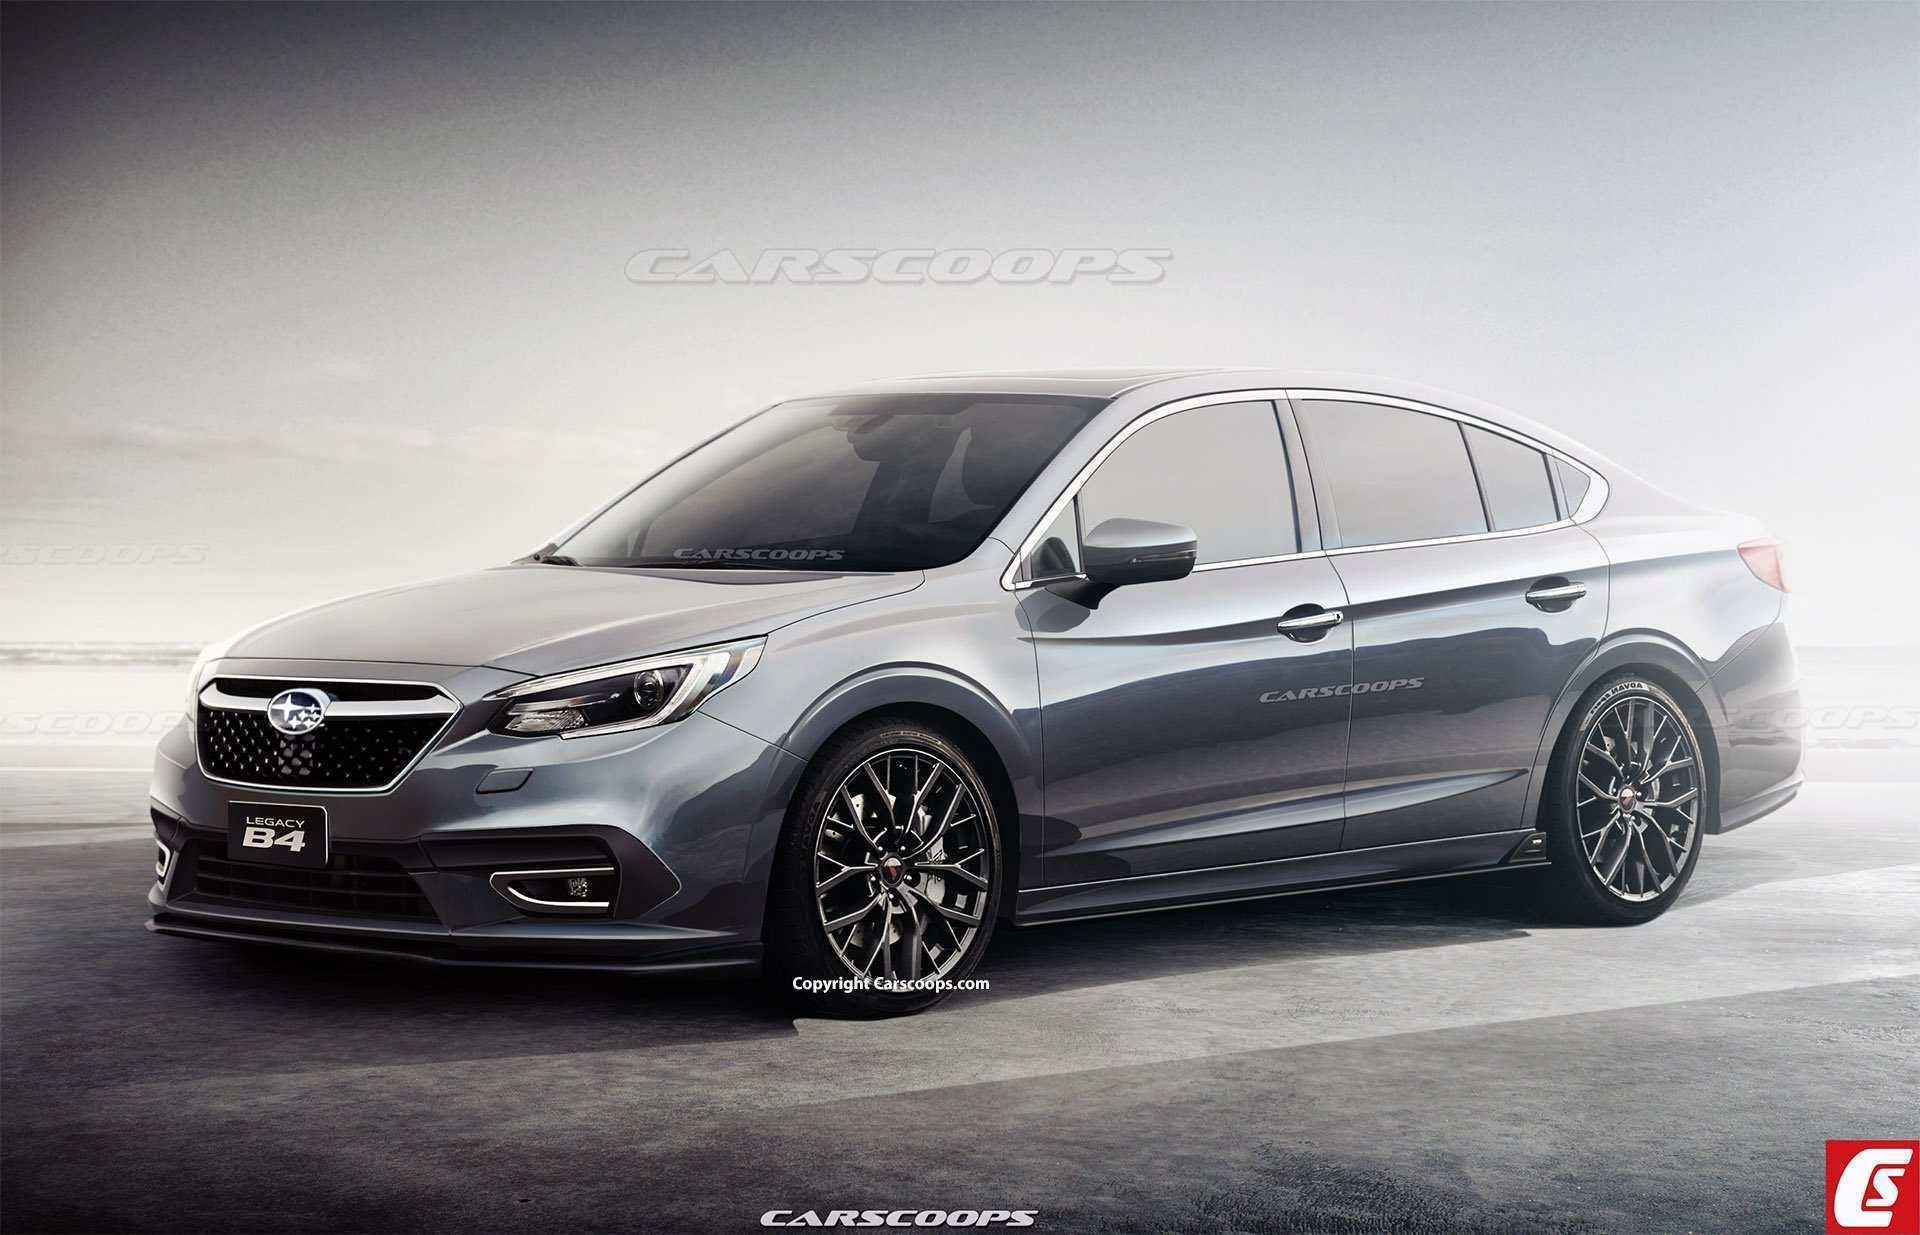 75 Concept of 2020 Subaru Legacy Reviews with 2020 Subaru Legacy